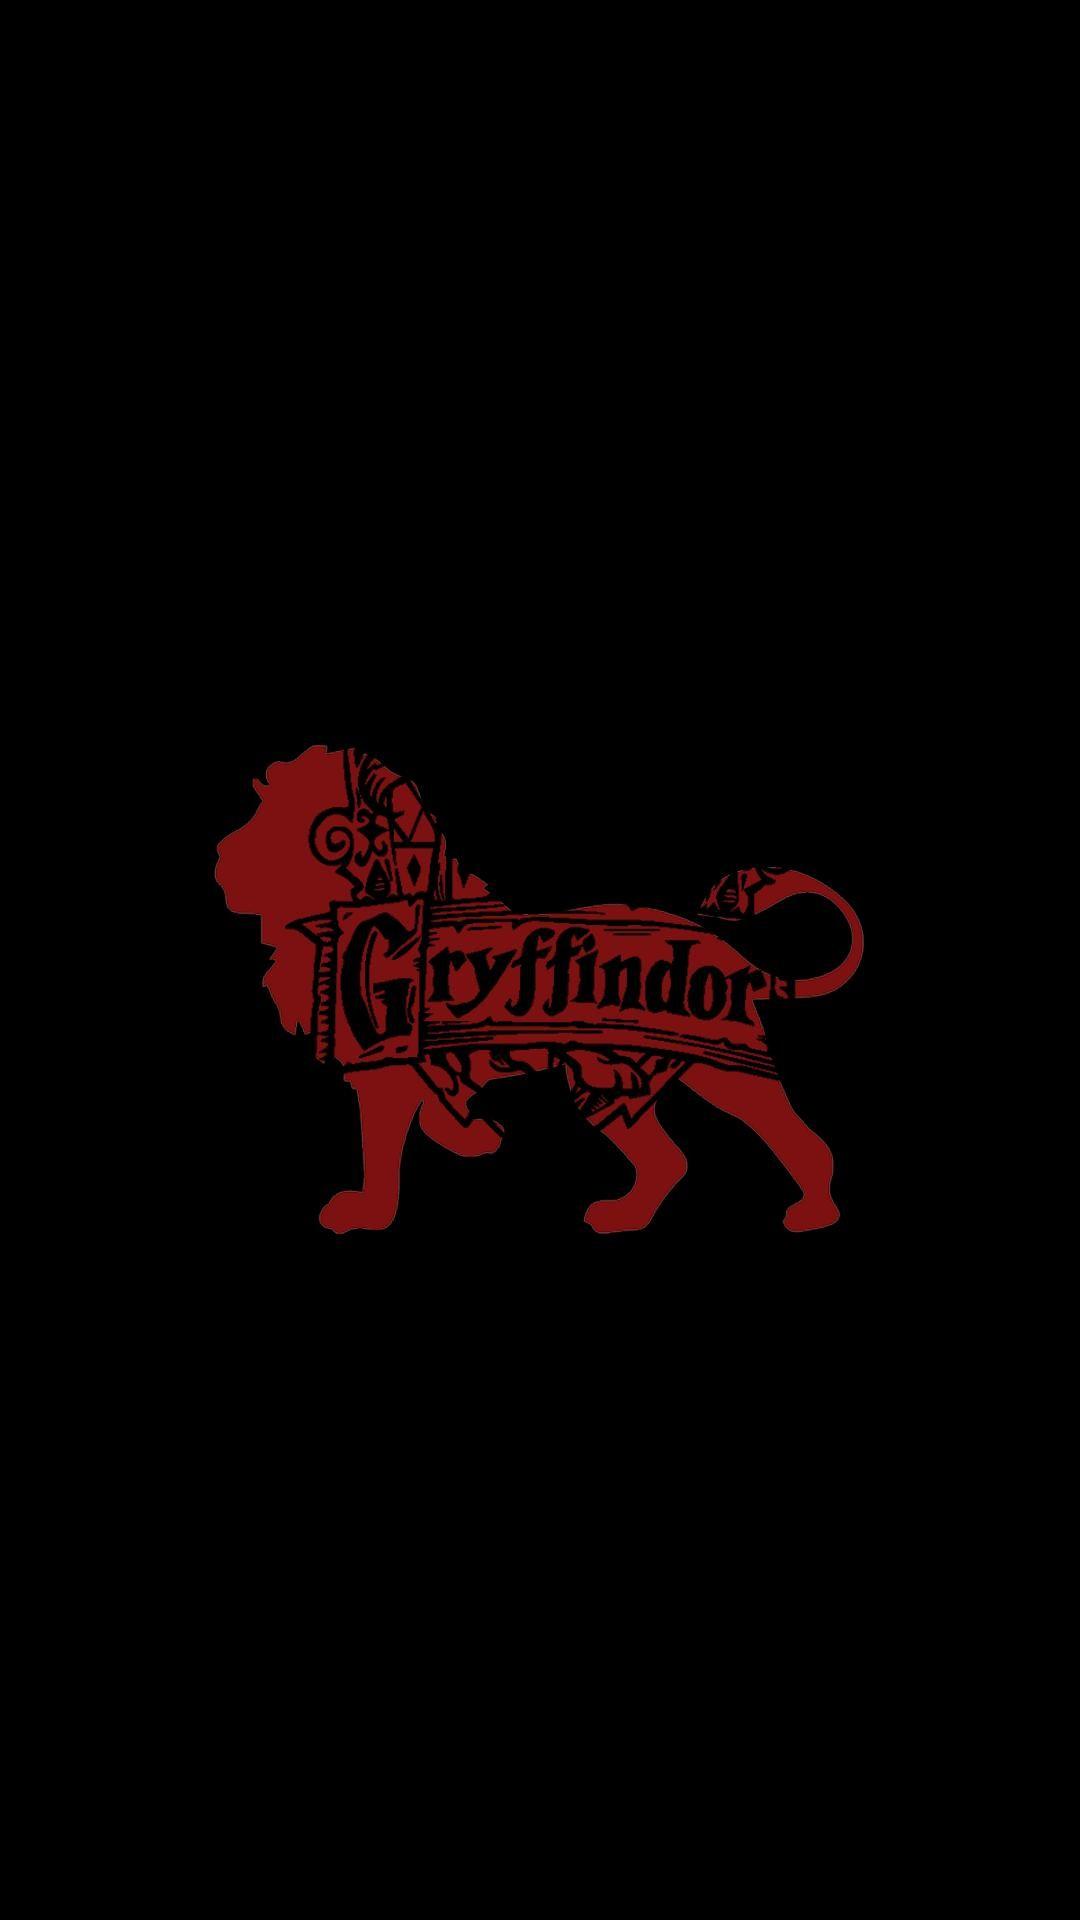 Gryffindor-wallpaper-wp425900